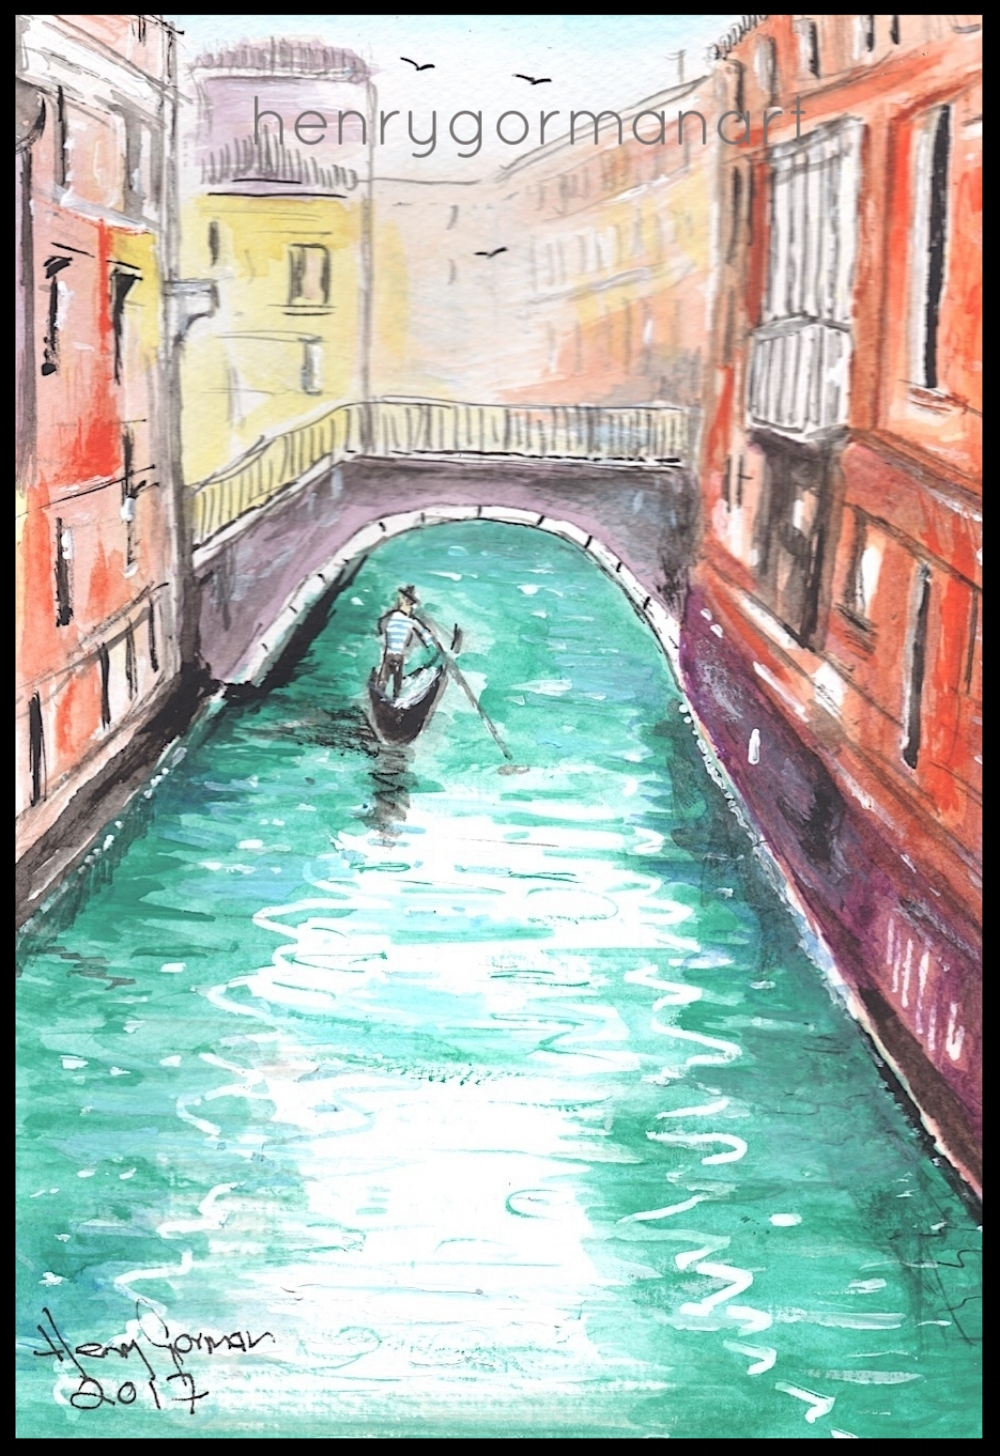 'The lonesome boatman'